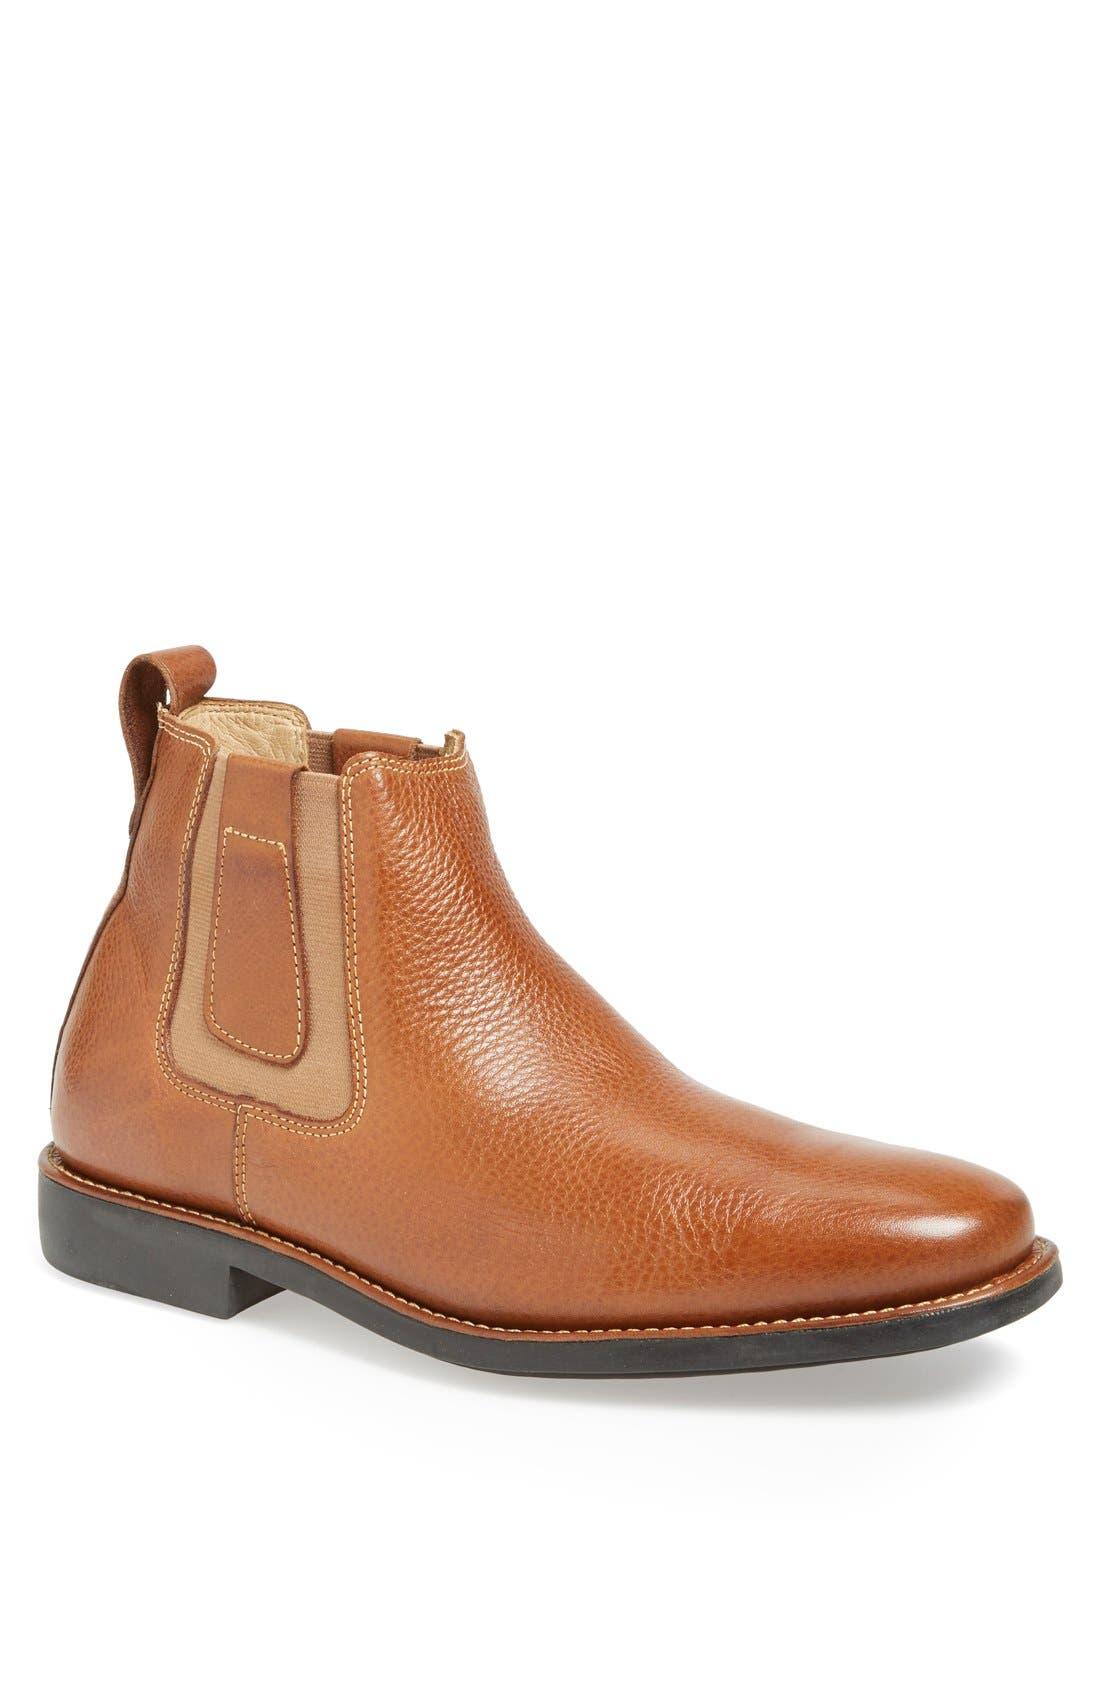 Anatomic & Co Natal Chelsea Boot (Men)